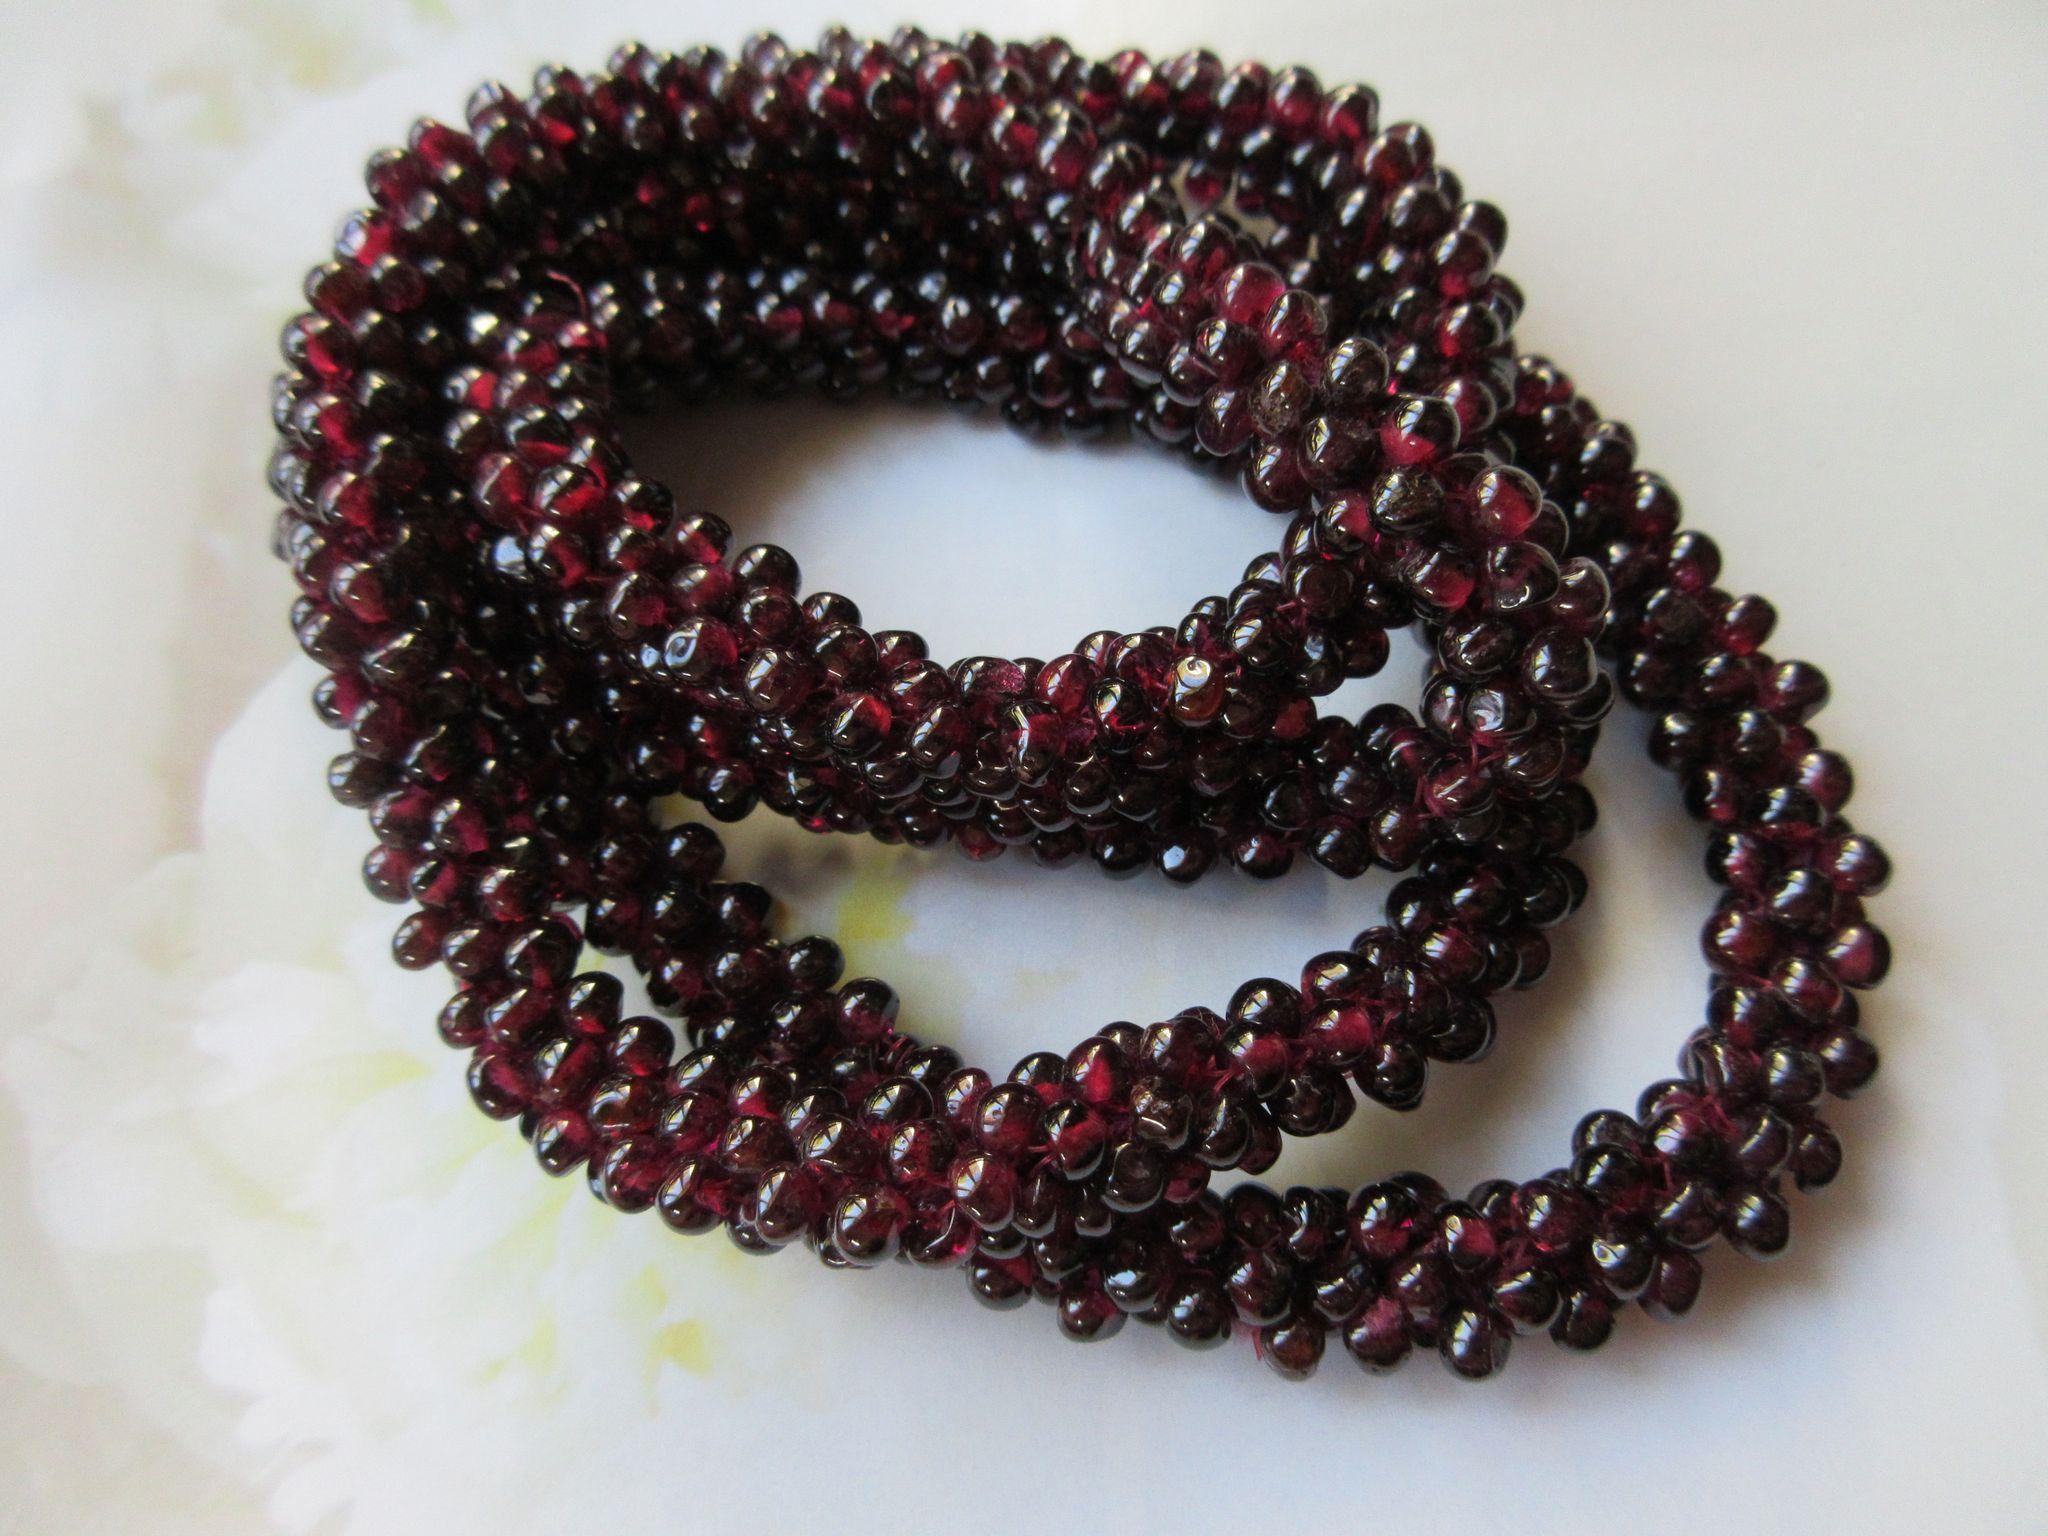 Vintage Woven Garnet Seed Bead Necklace, January Birthstone